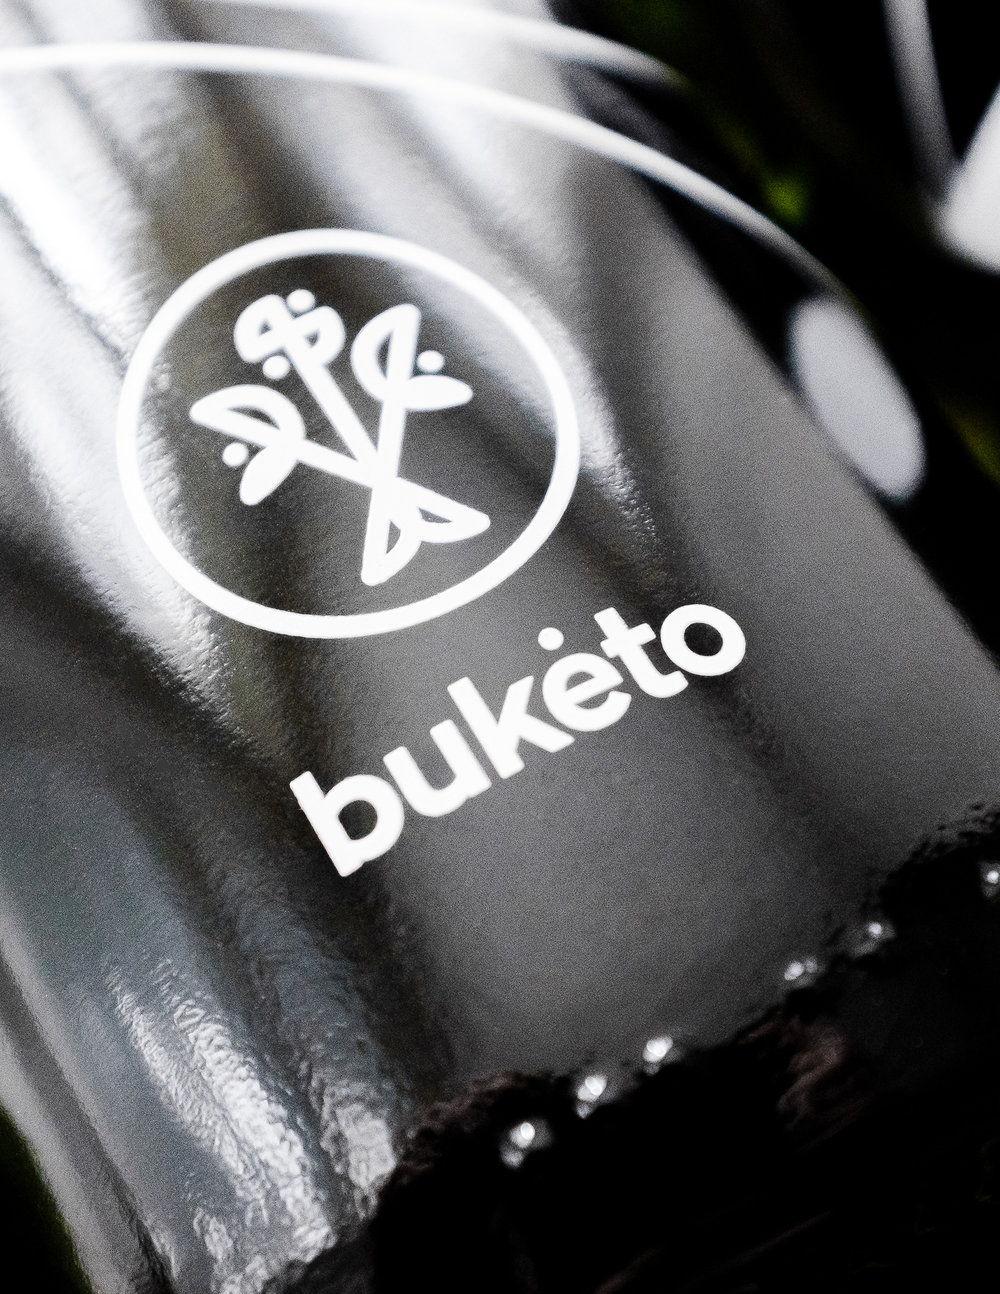 Buketo wine bottle design by Lazy snail Design